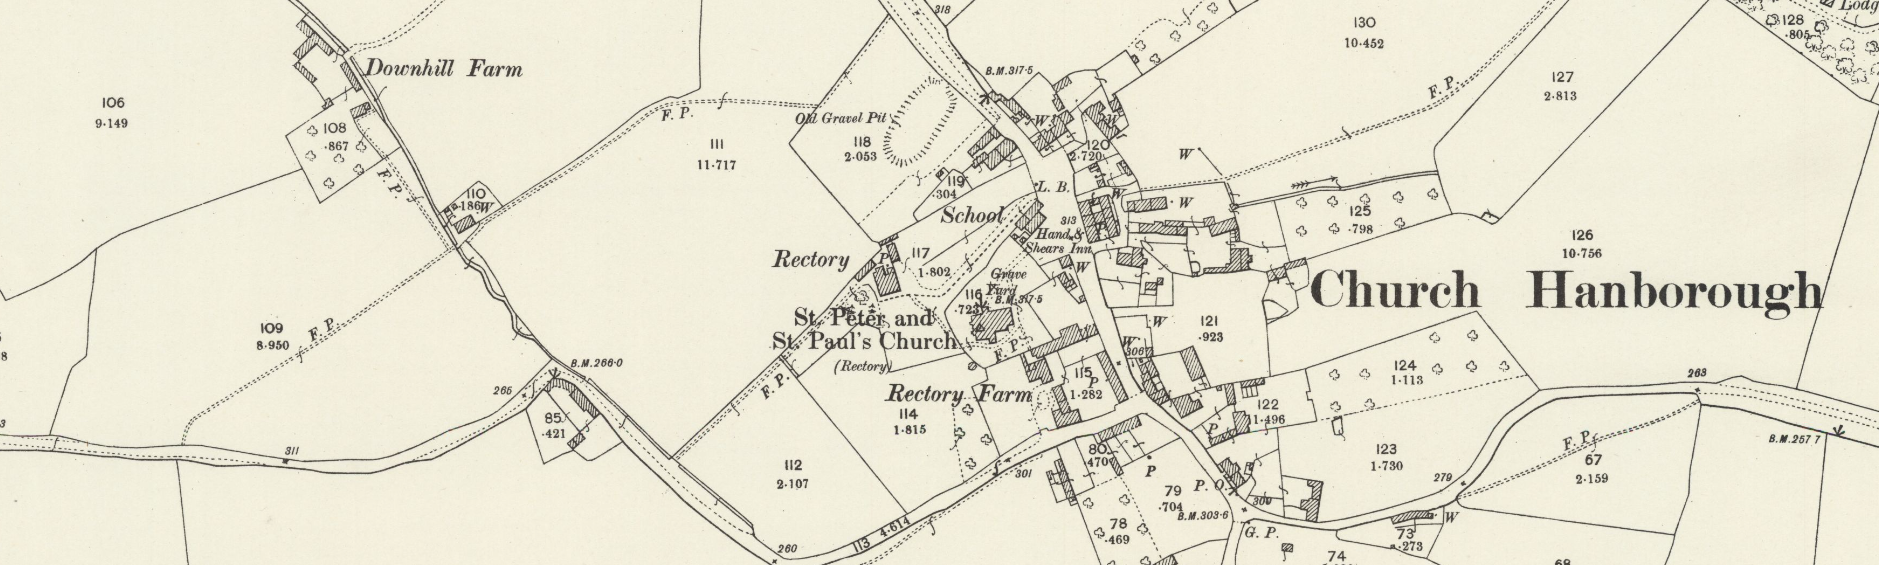 Map of Church Handborough, c1919